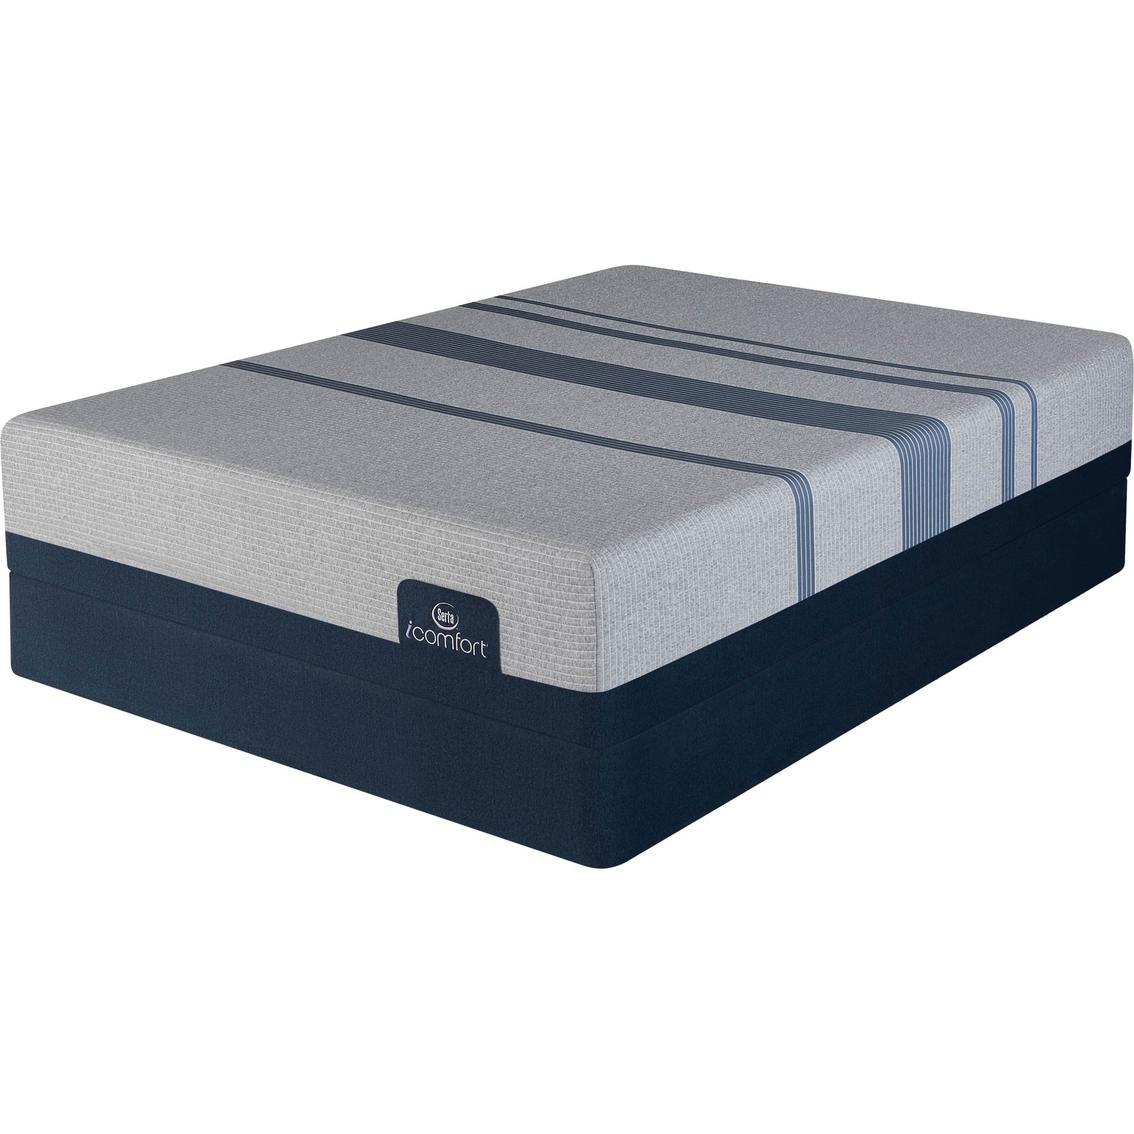 Serta Icomfort Blue Max 3000 Memory Foam Plush Low Profile Mattress